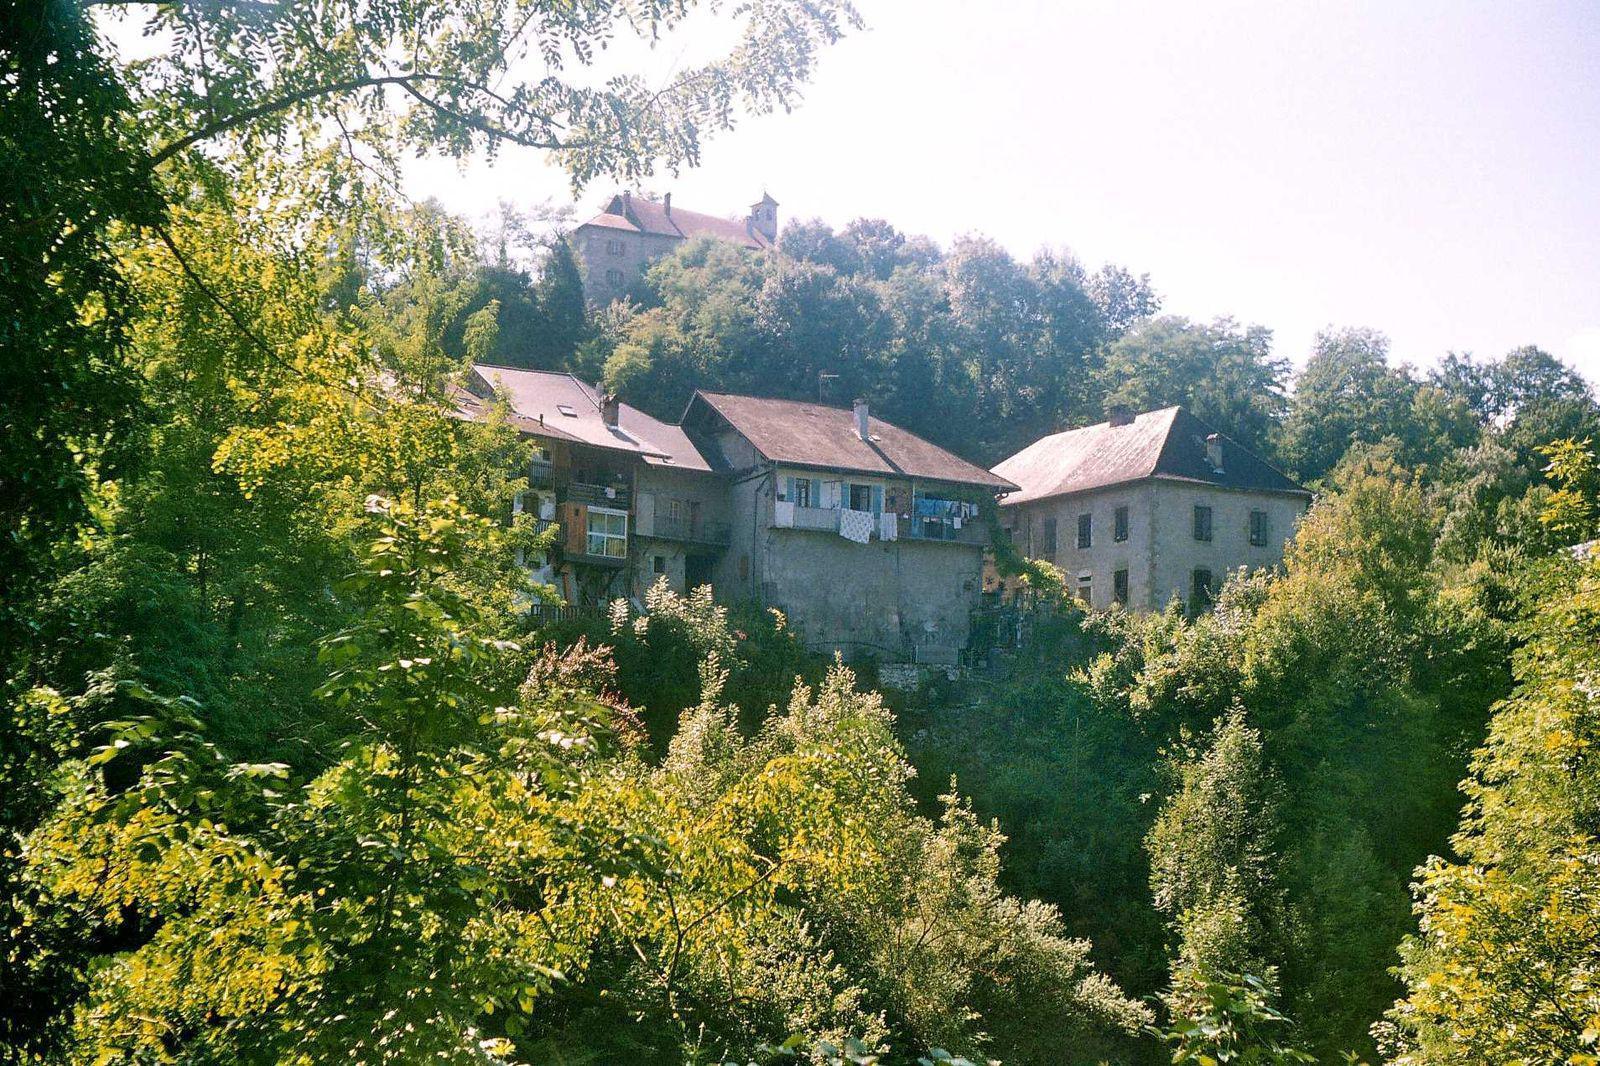 Alby-sur-Chéran